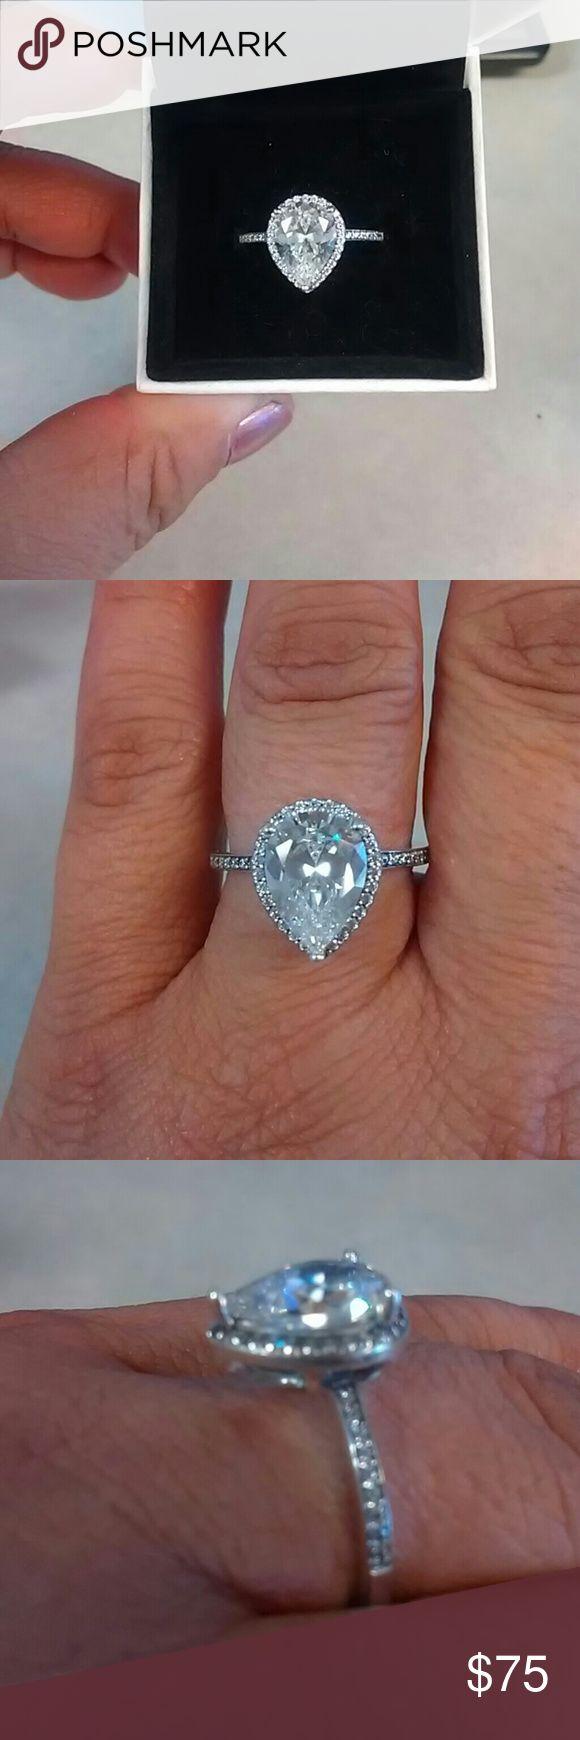 b626f2114 Authentic brand new Pandora Radiant Teardrop Ring Size 8 S925 ALE 56 Pandora  Jewelry Rings